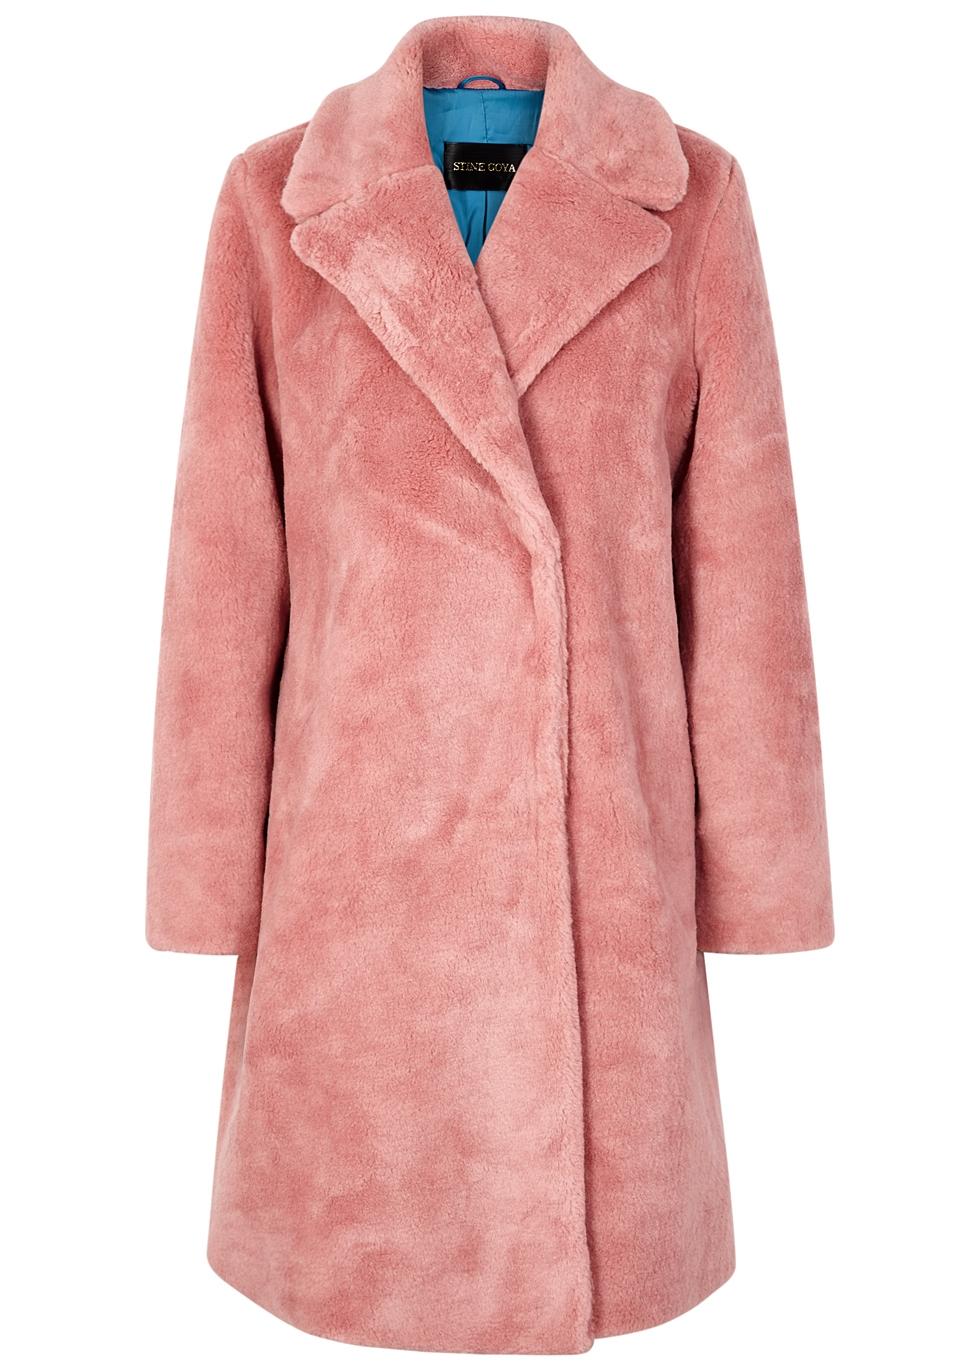 STINE GOYA Concord Pink Faux-Fur Coat